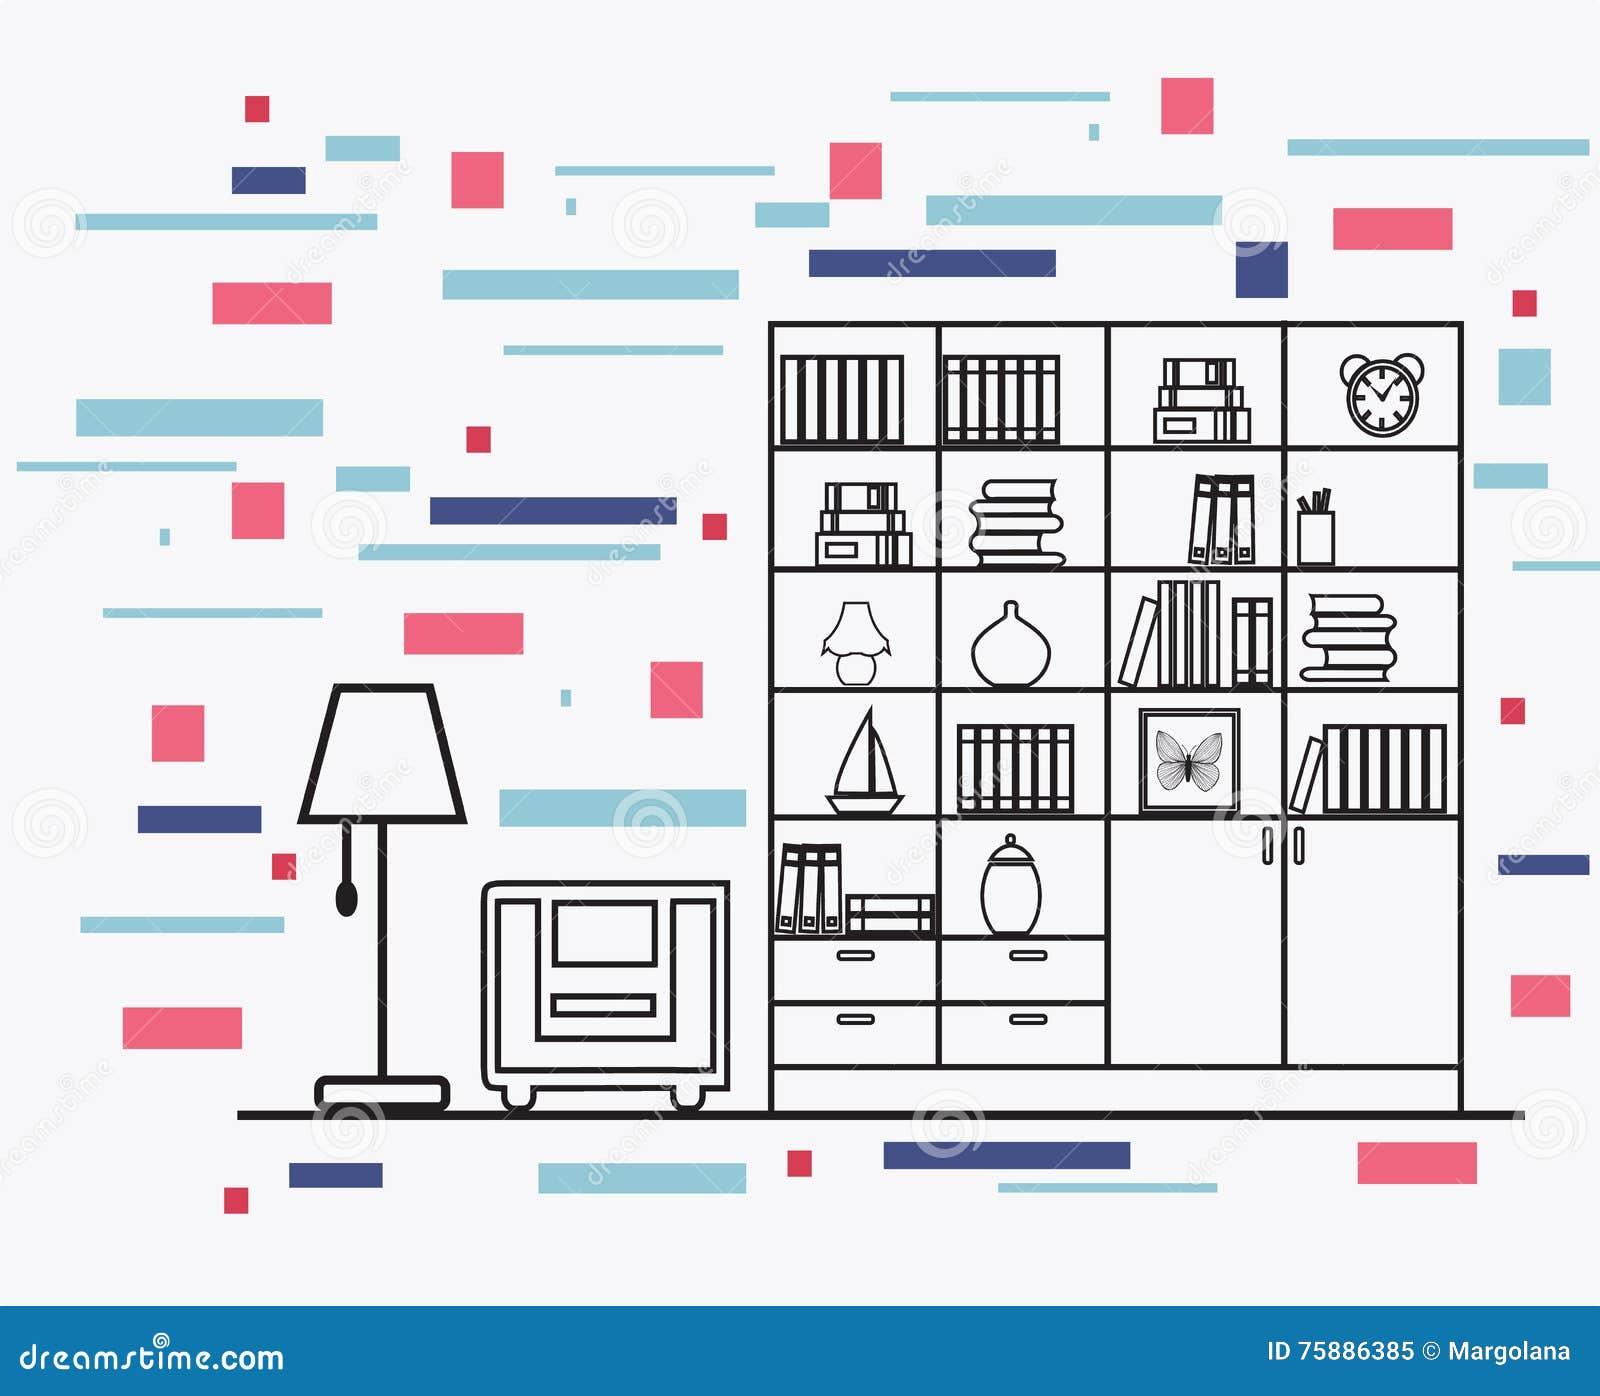 Rc Furniture Interior Design Stock Dealer ~ Furniture cartoons illustrations vector stock images